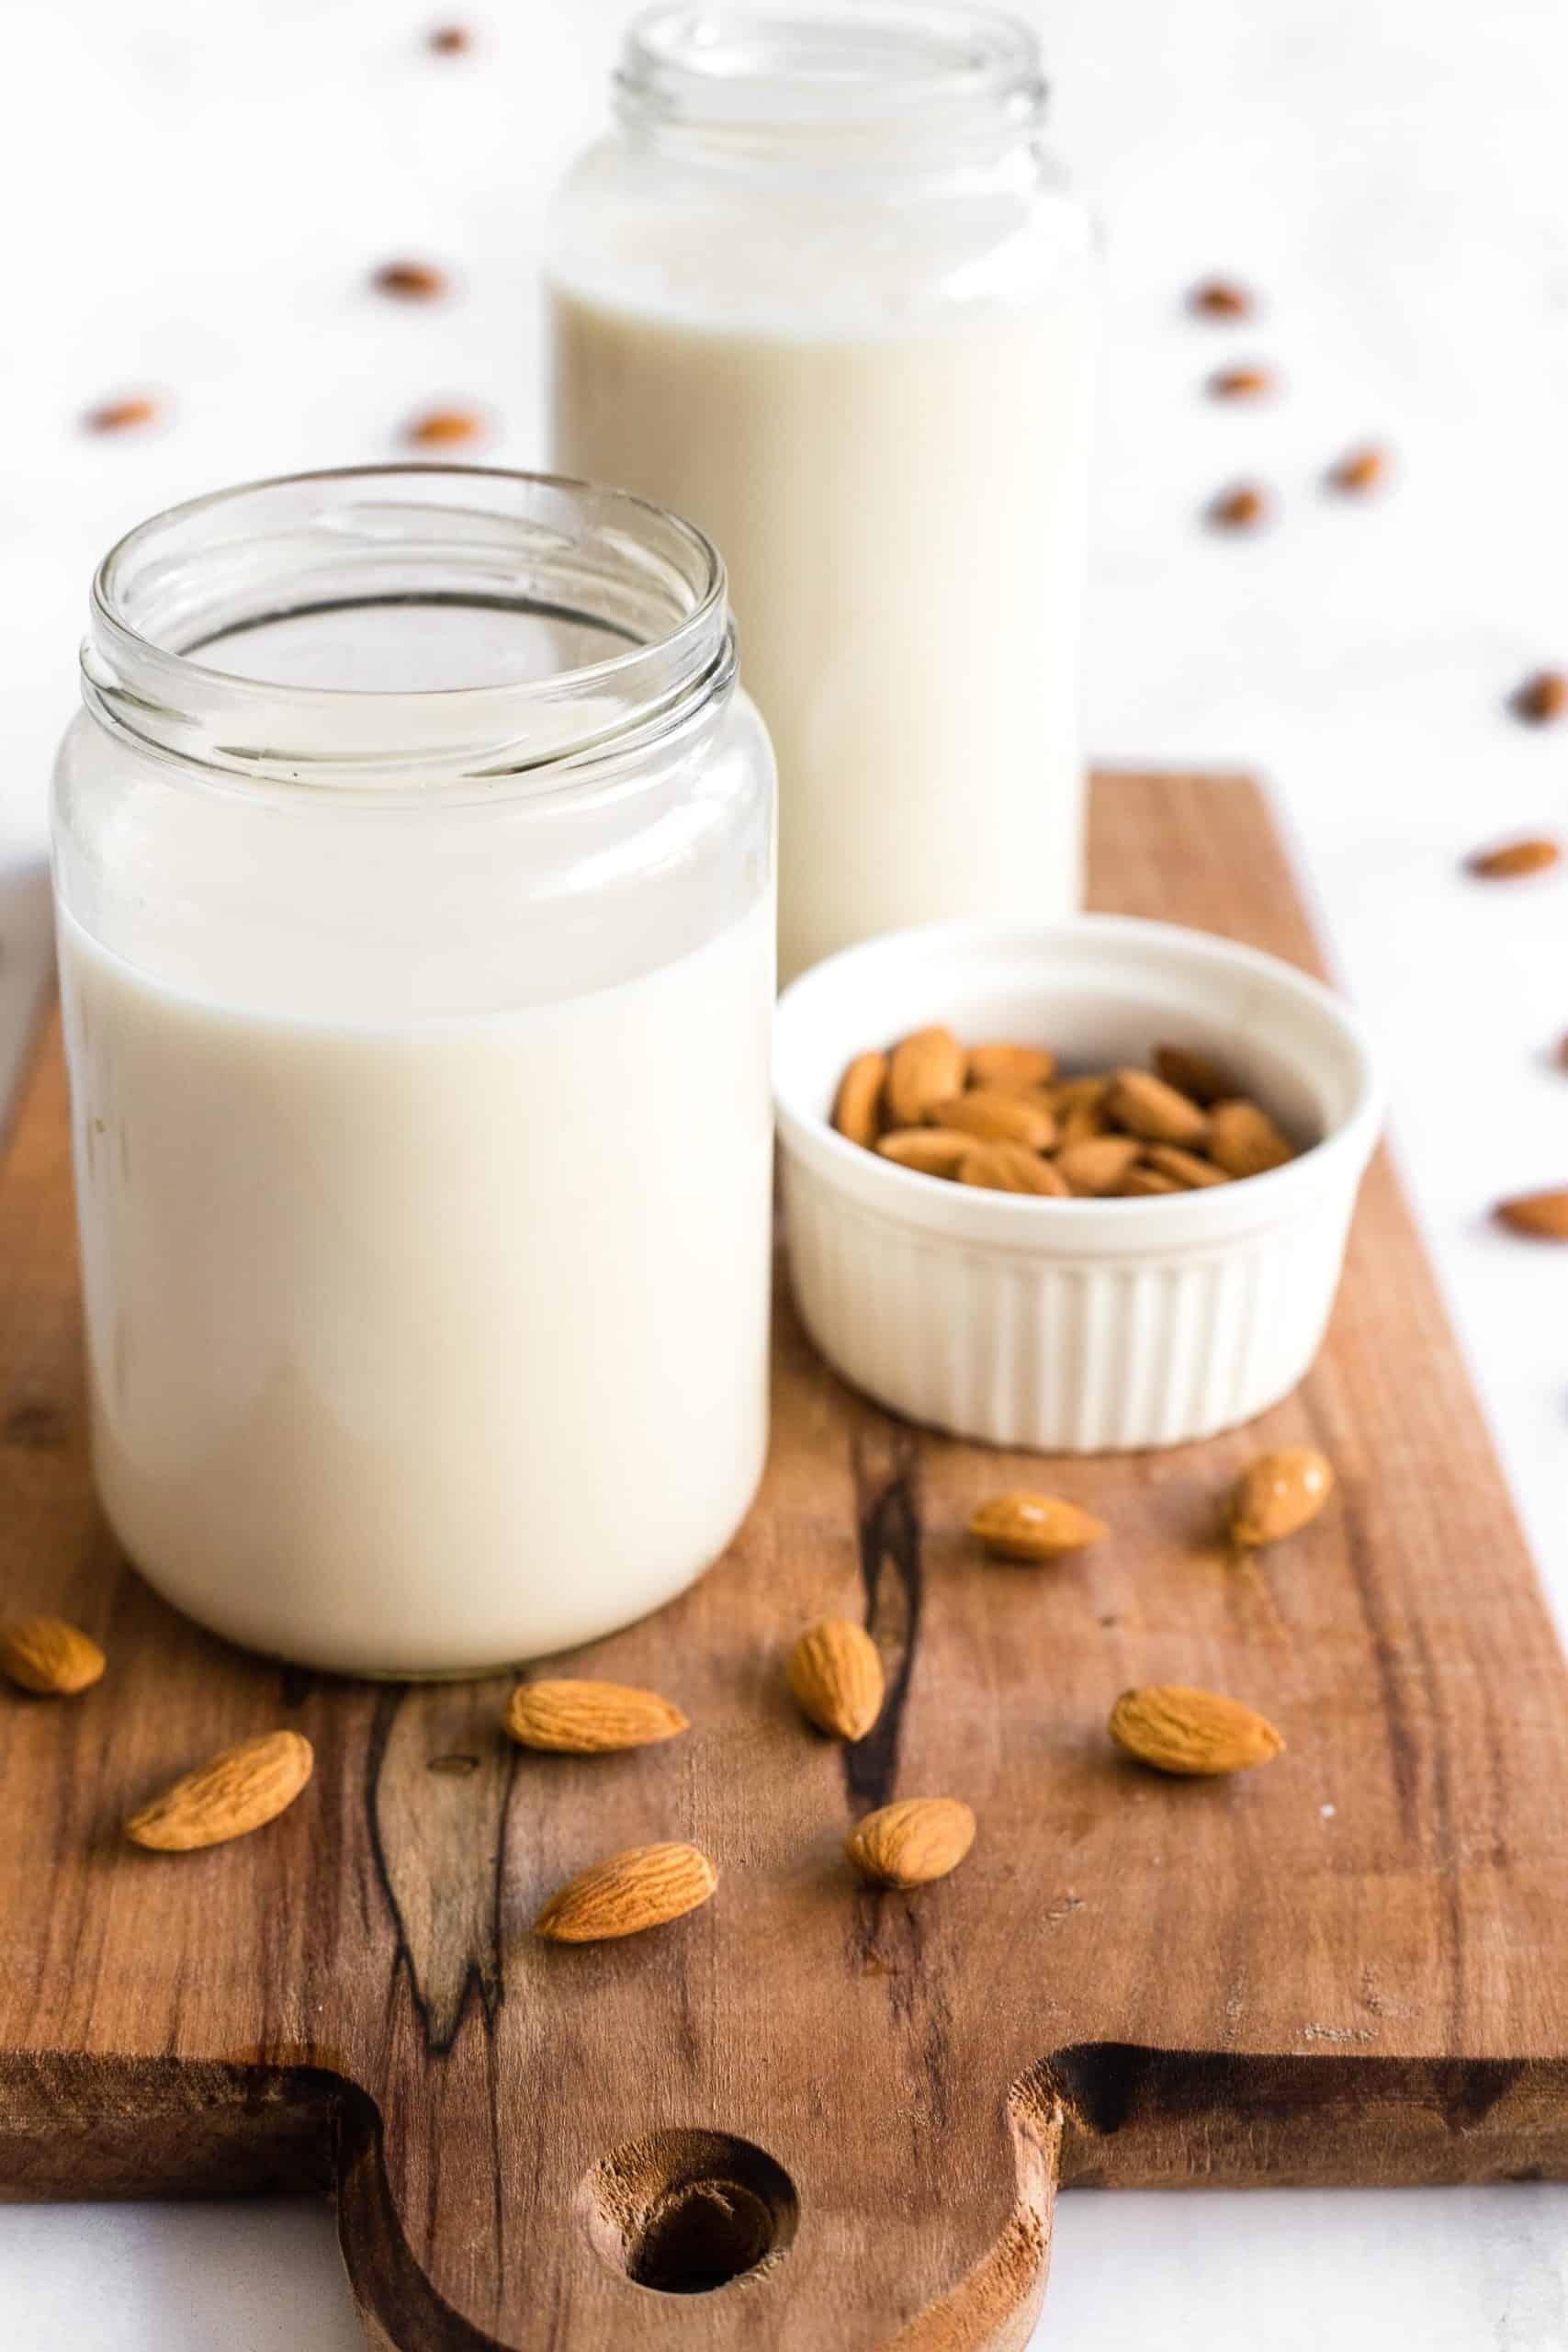 Bottles of freshly made almond milk on a wooden board.